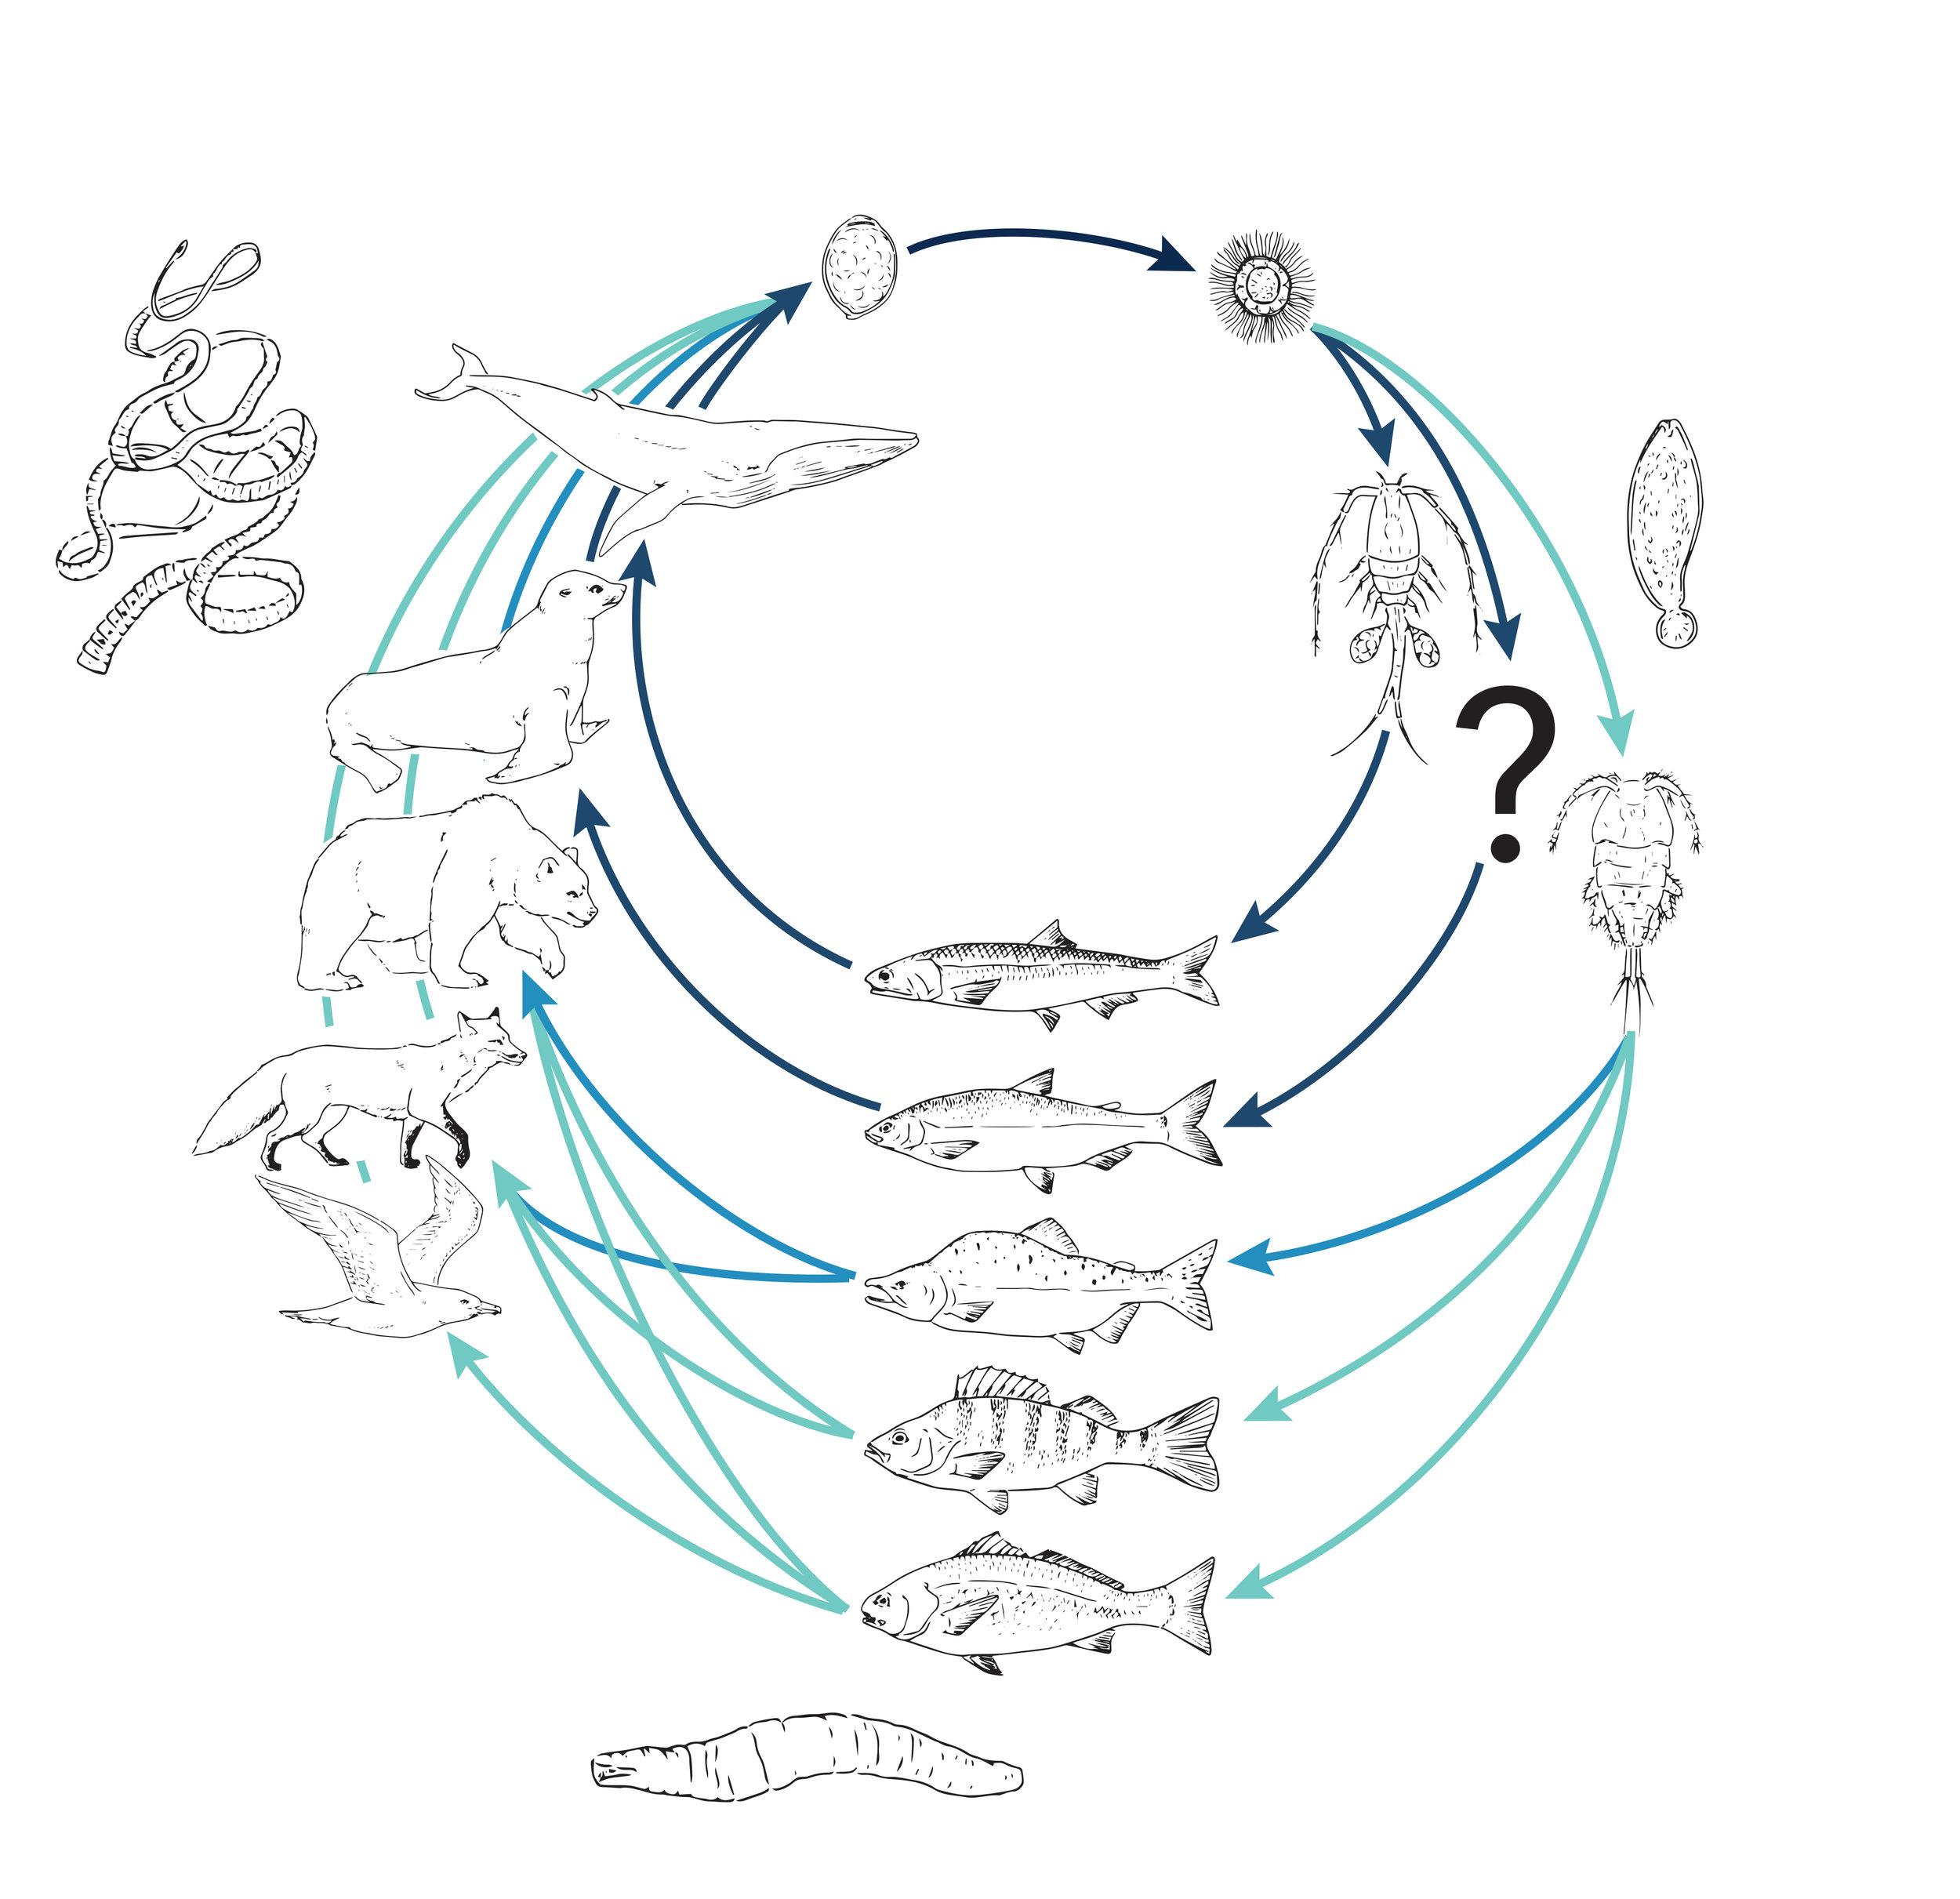 Diphyllobothrium lifecycle (b&w).jpg